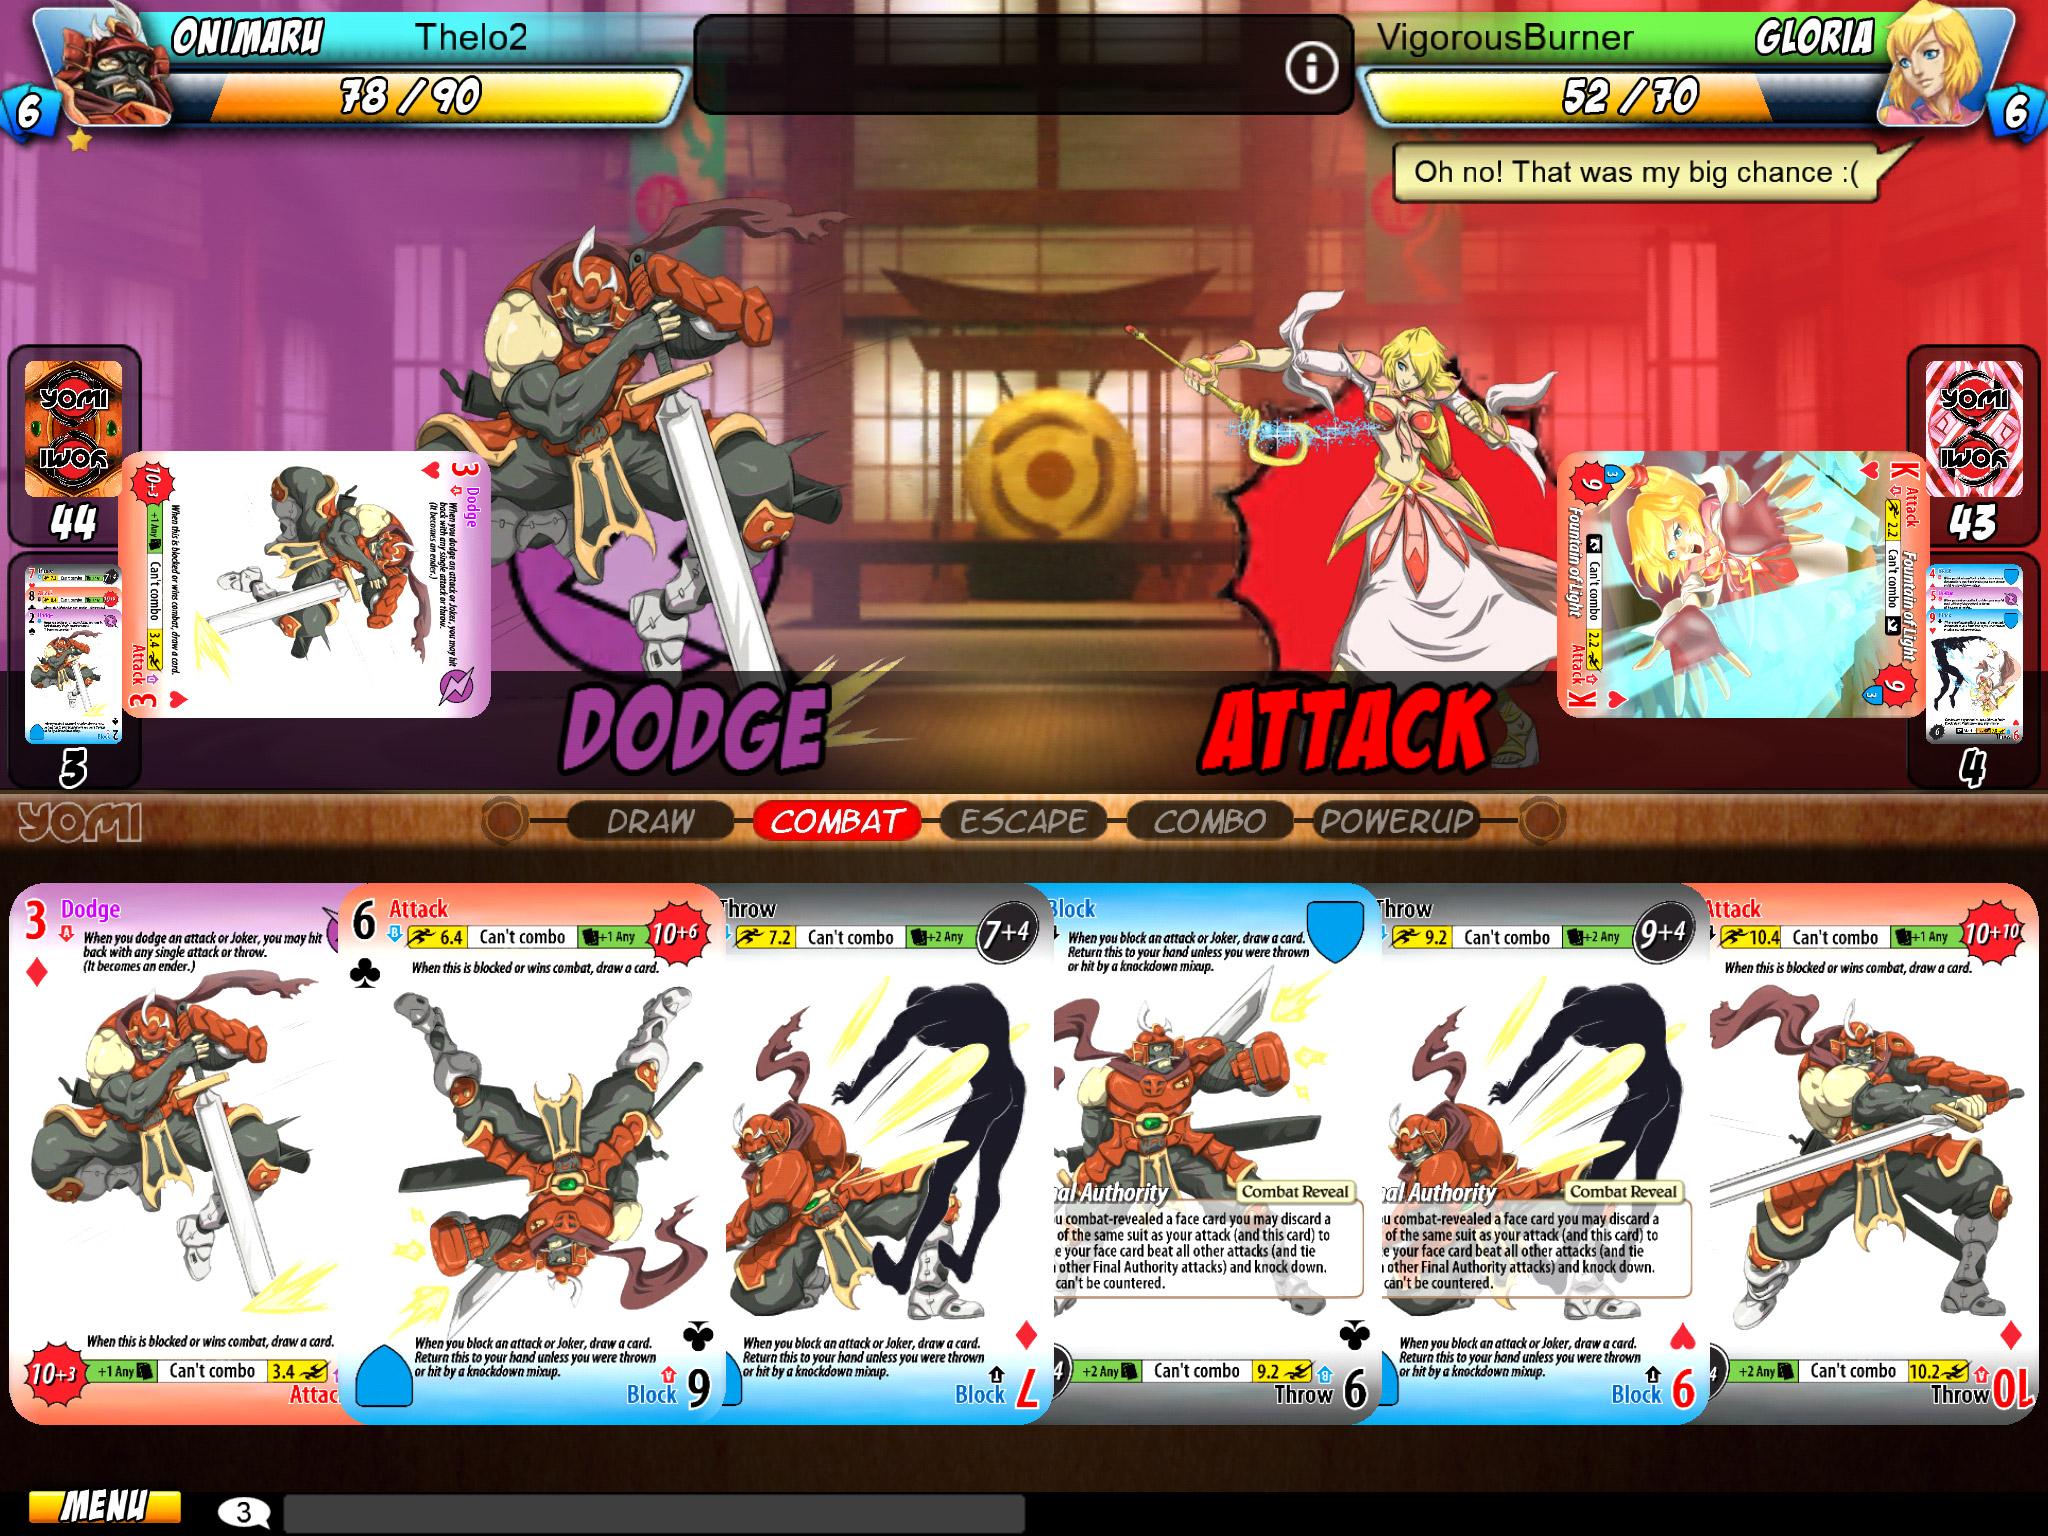 SS2014-iPadYomi-CombatReveal